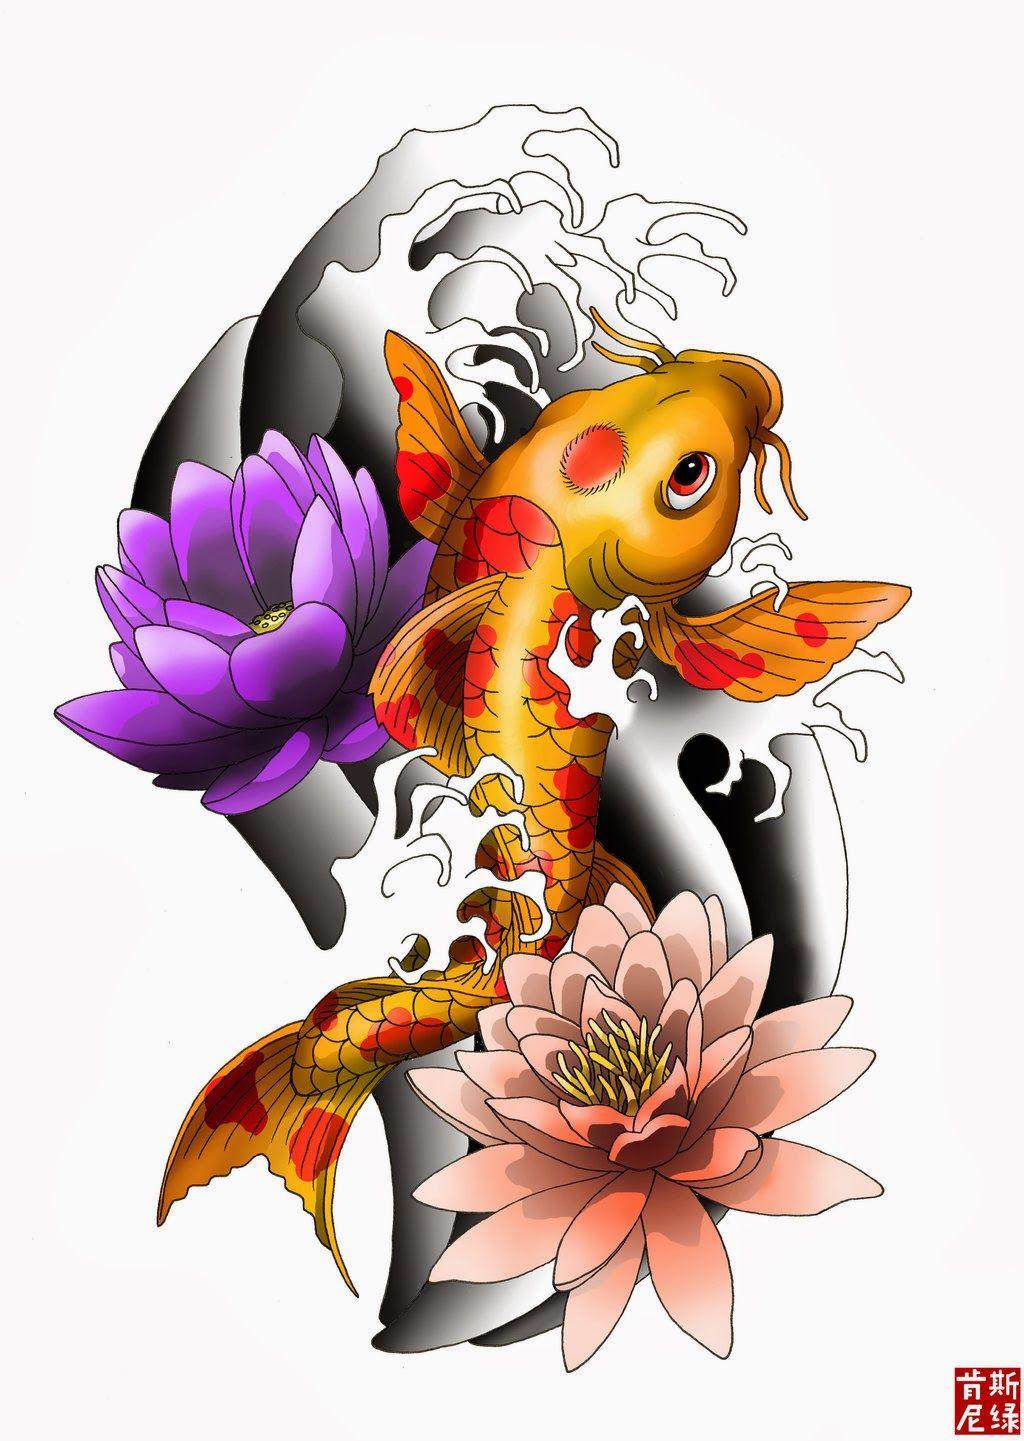 tatuajes koi - Buscar con Google | El Unico | Pinterest | Koi ...